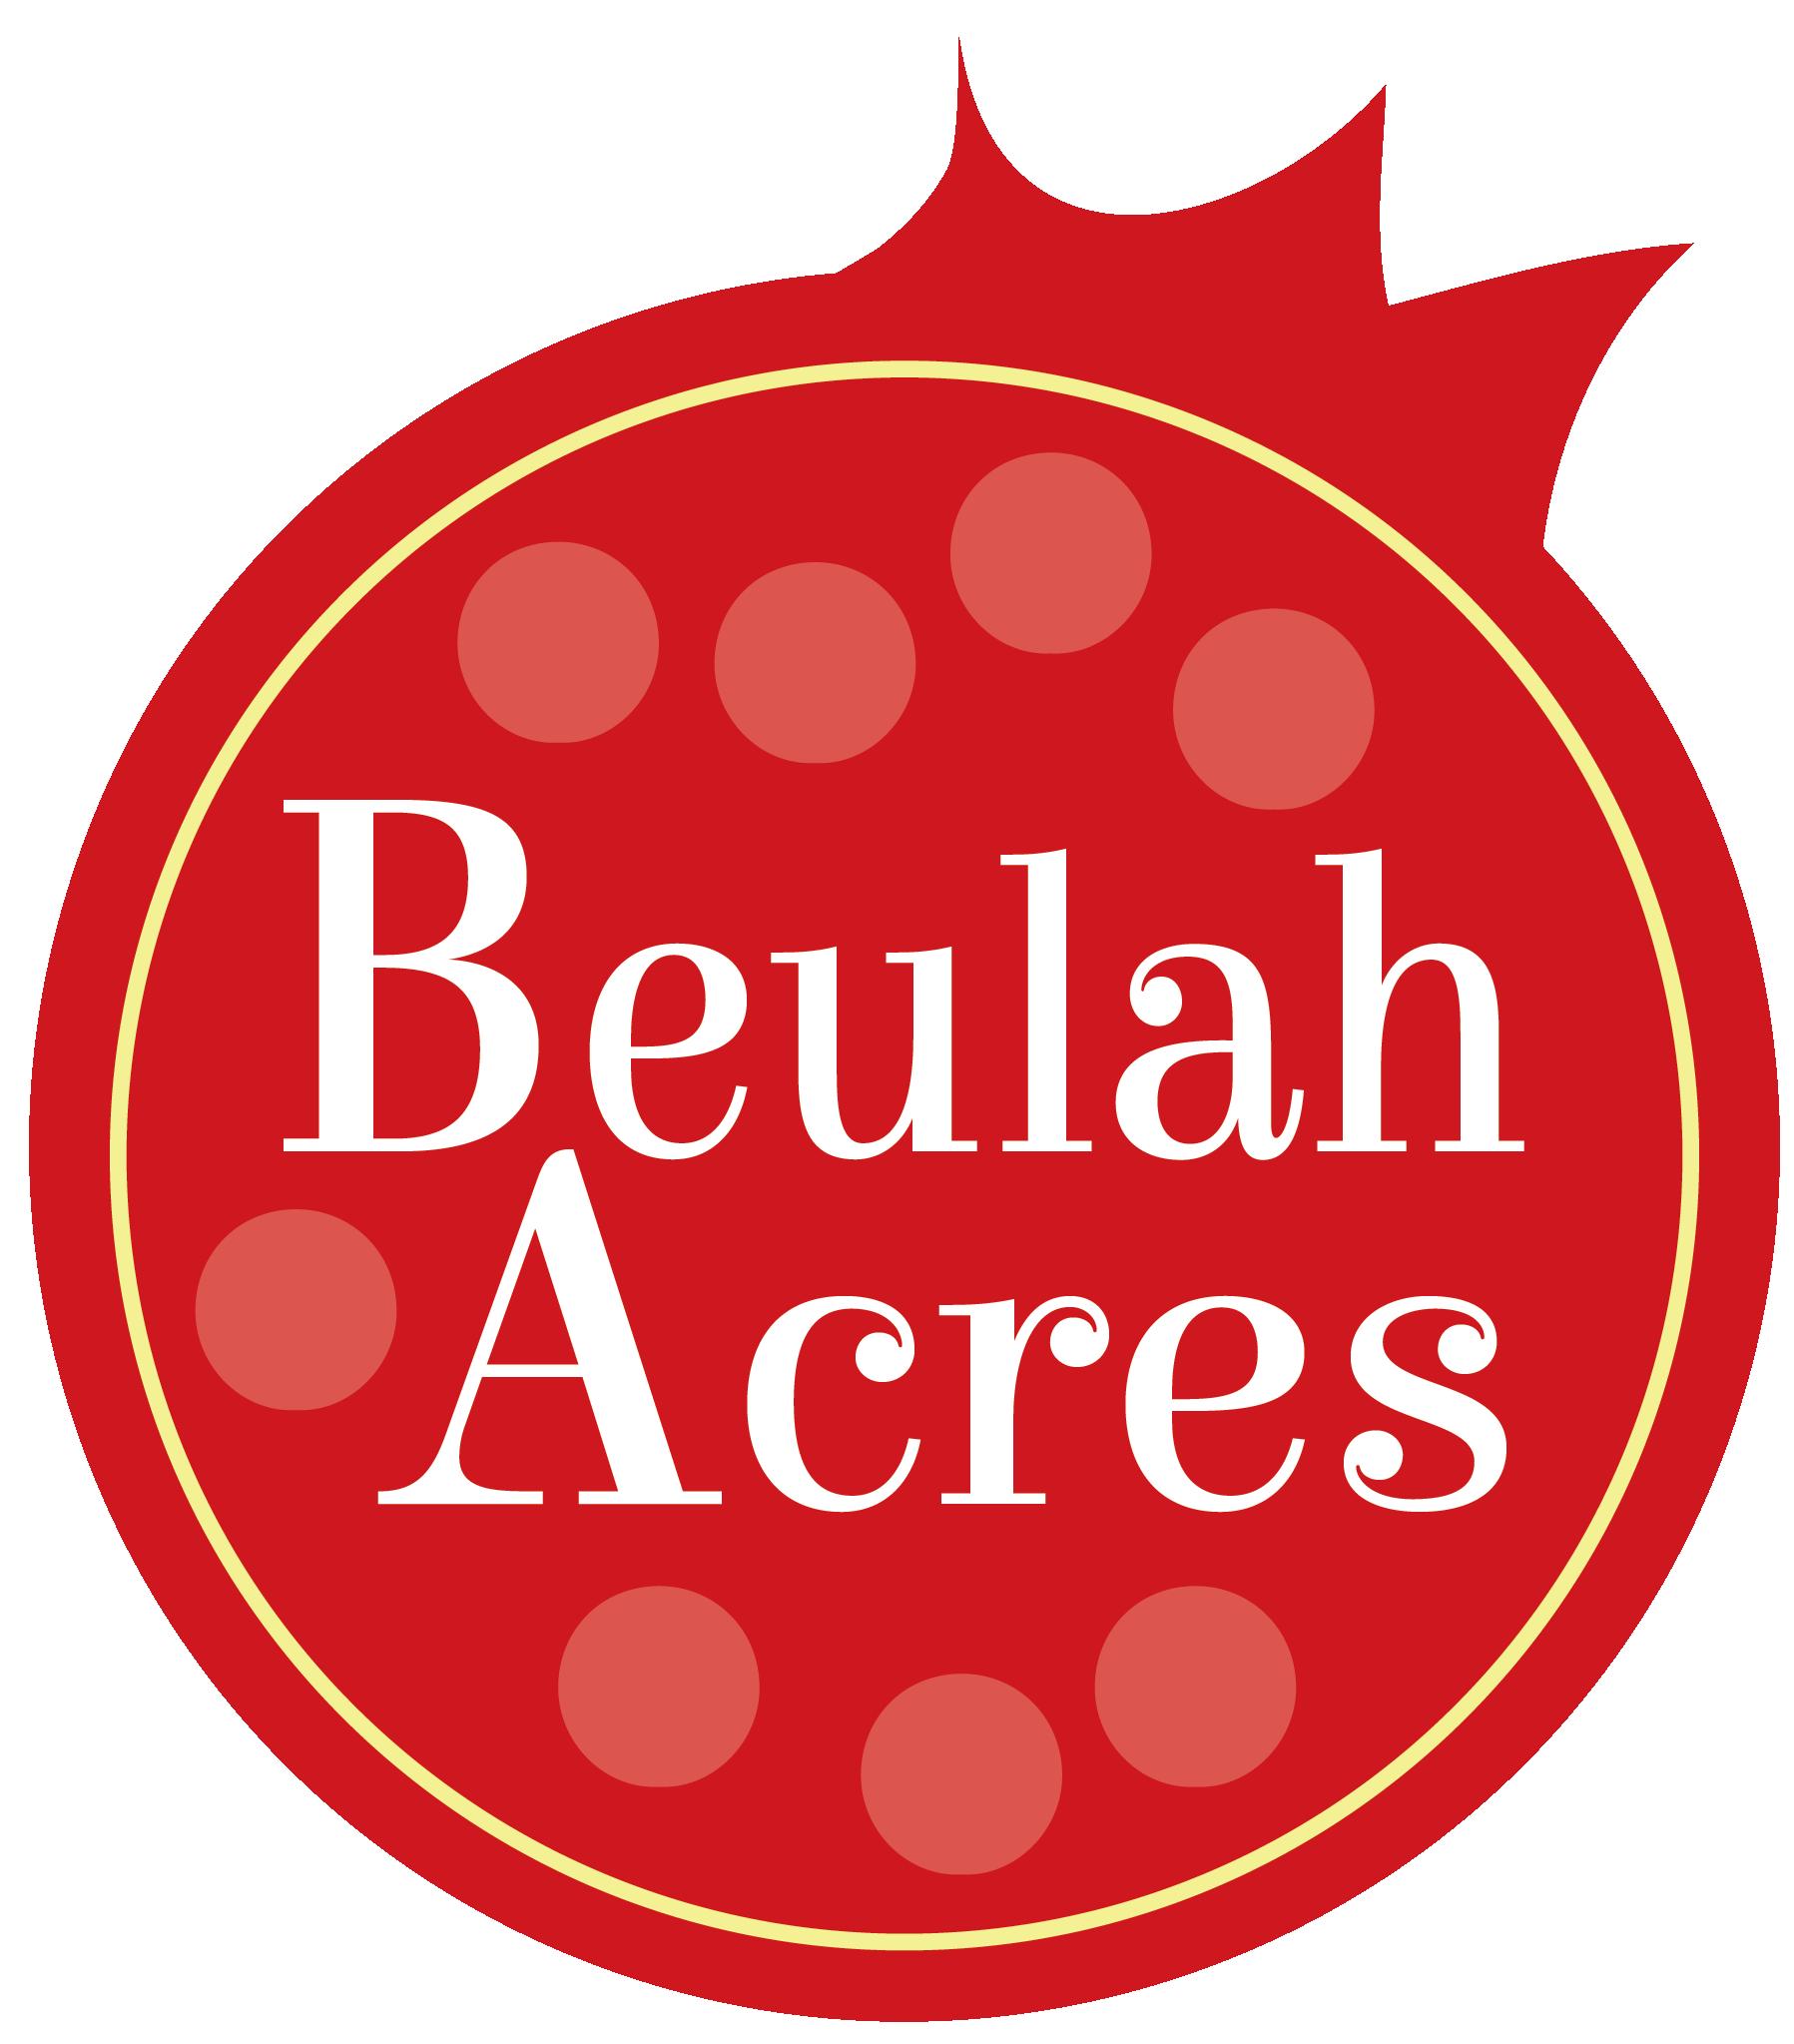 Beulah Acres